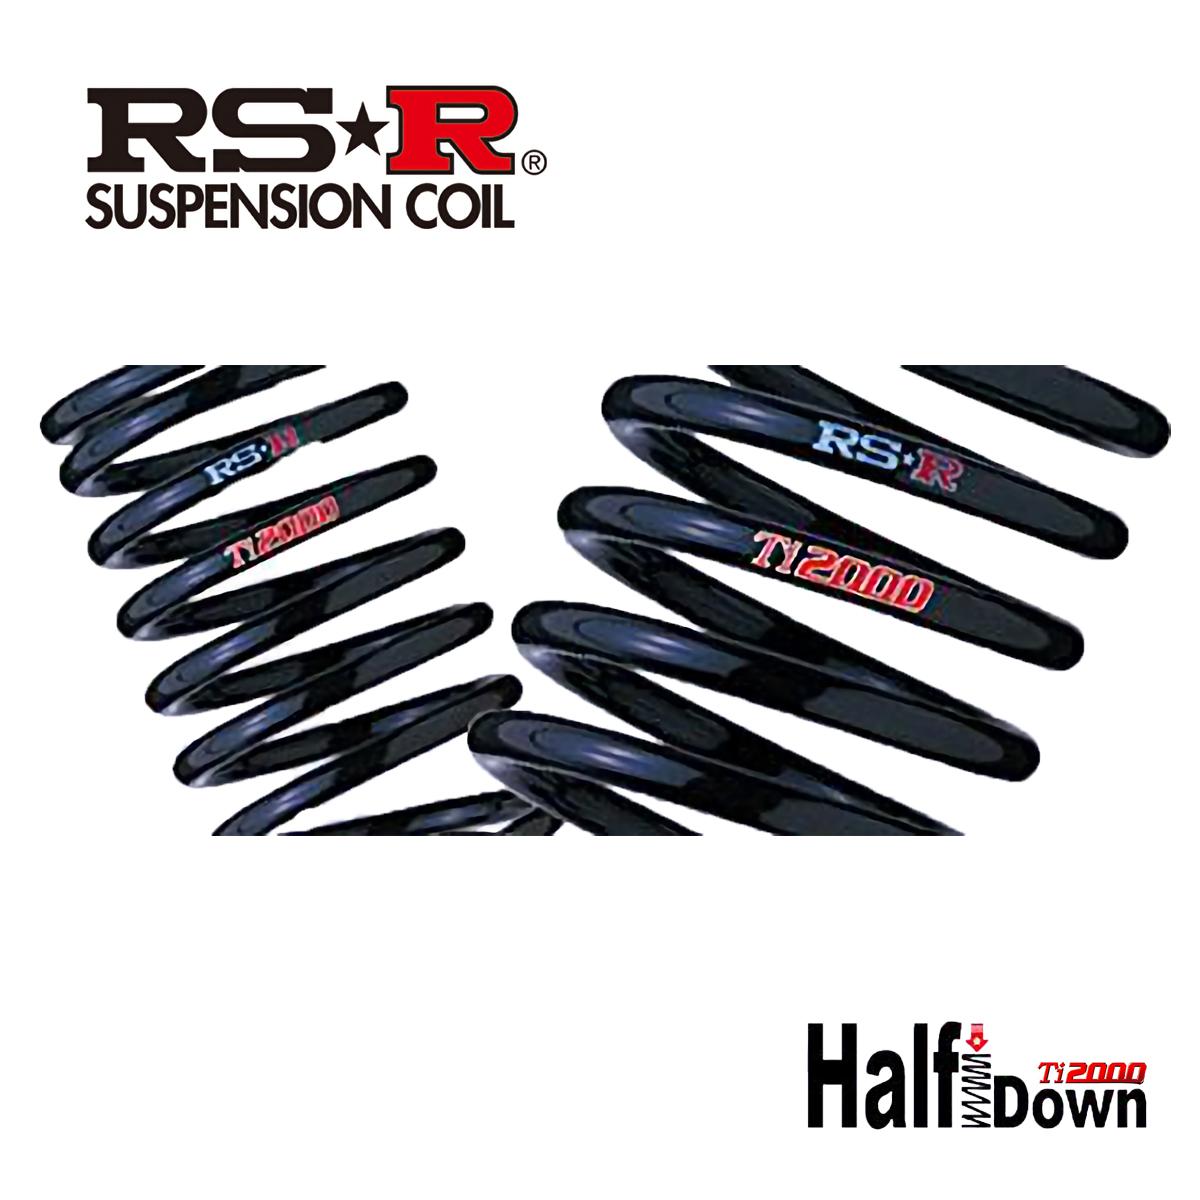 RS-R ヴォクシー ハイブリッドZS煌II ZWR80W ダウンサス スプリング フロント T931THDF Ti2000 ハーフダウン RSR 個人宅発送追金有